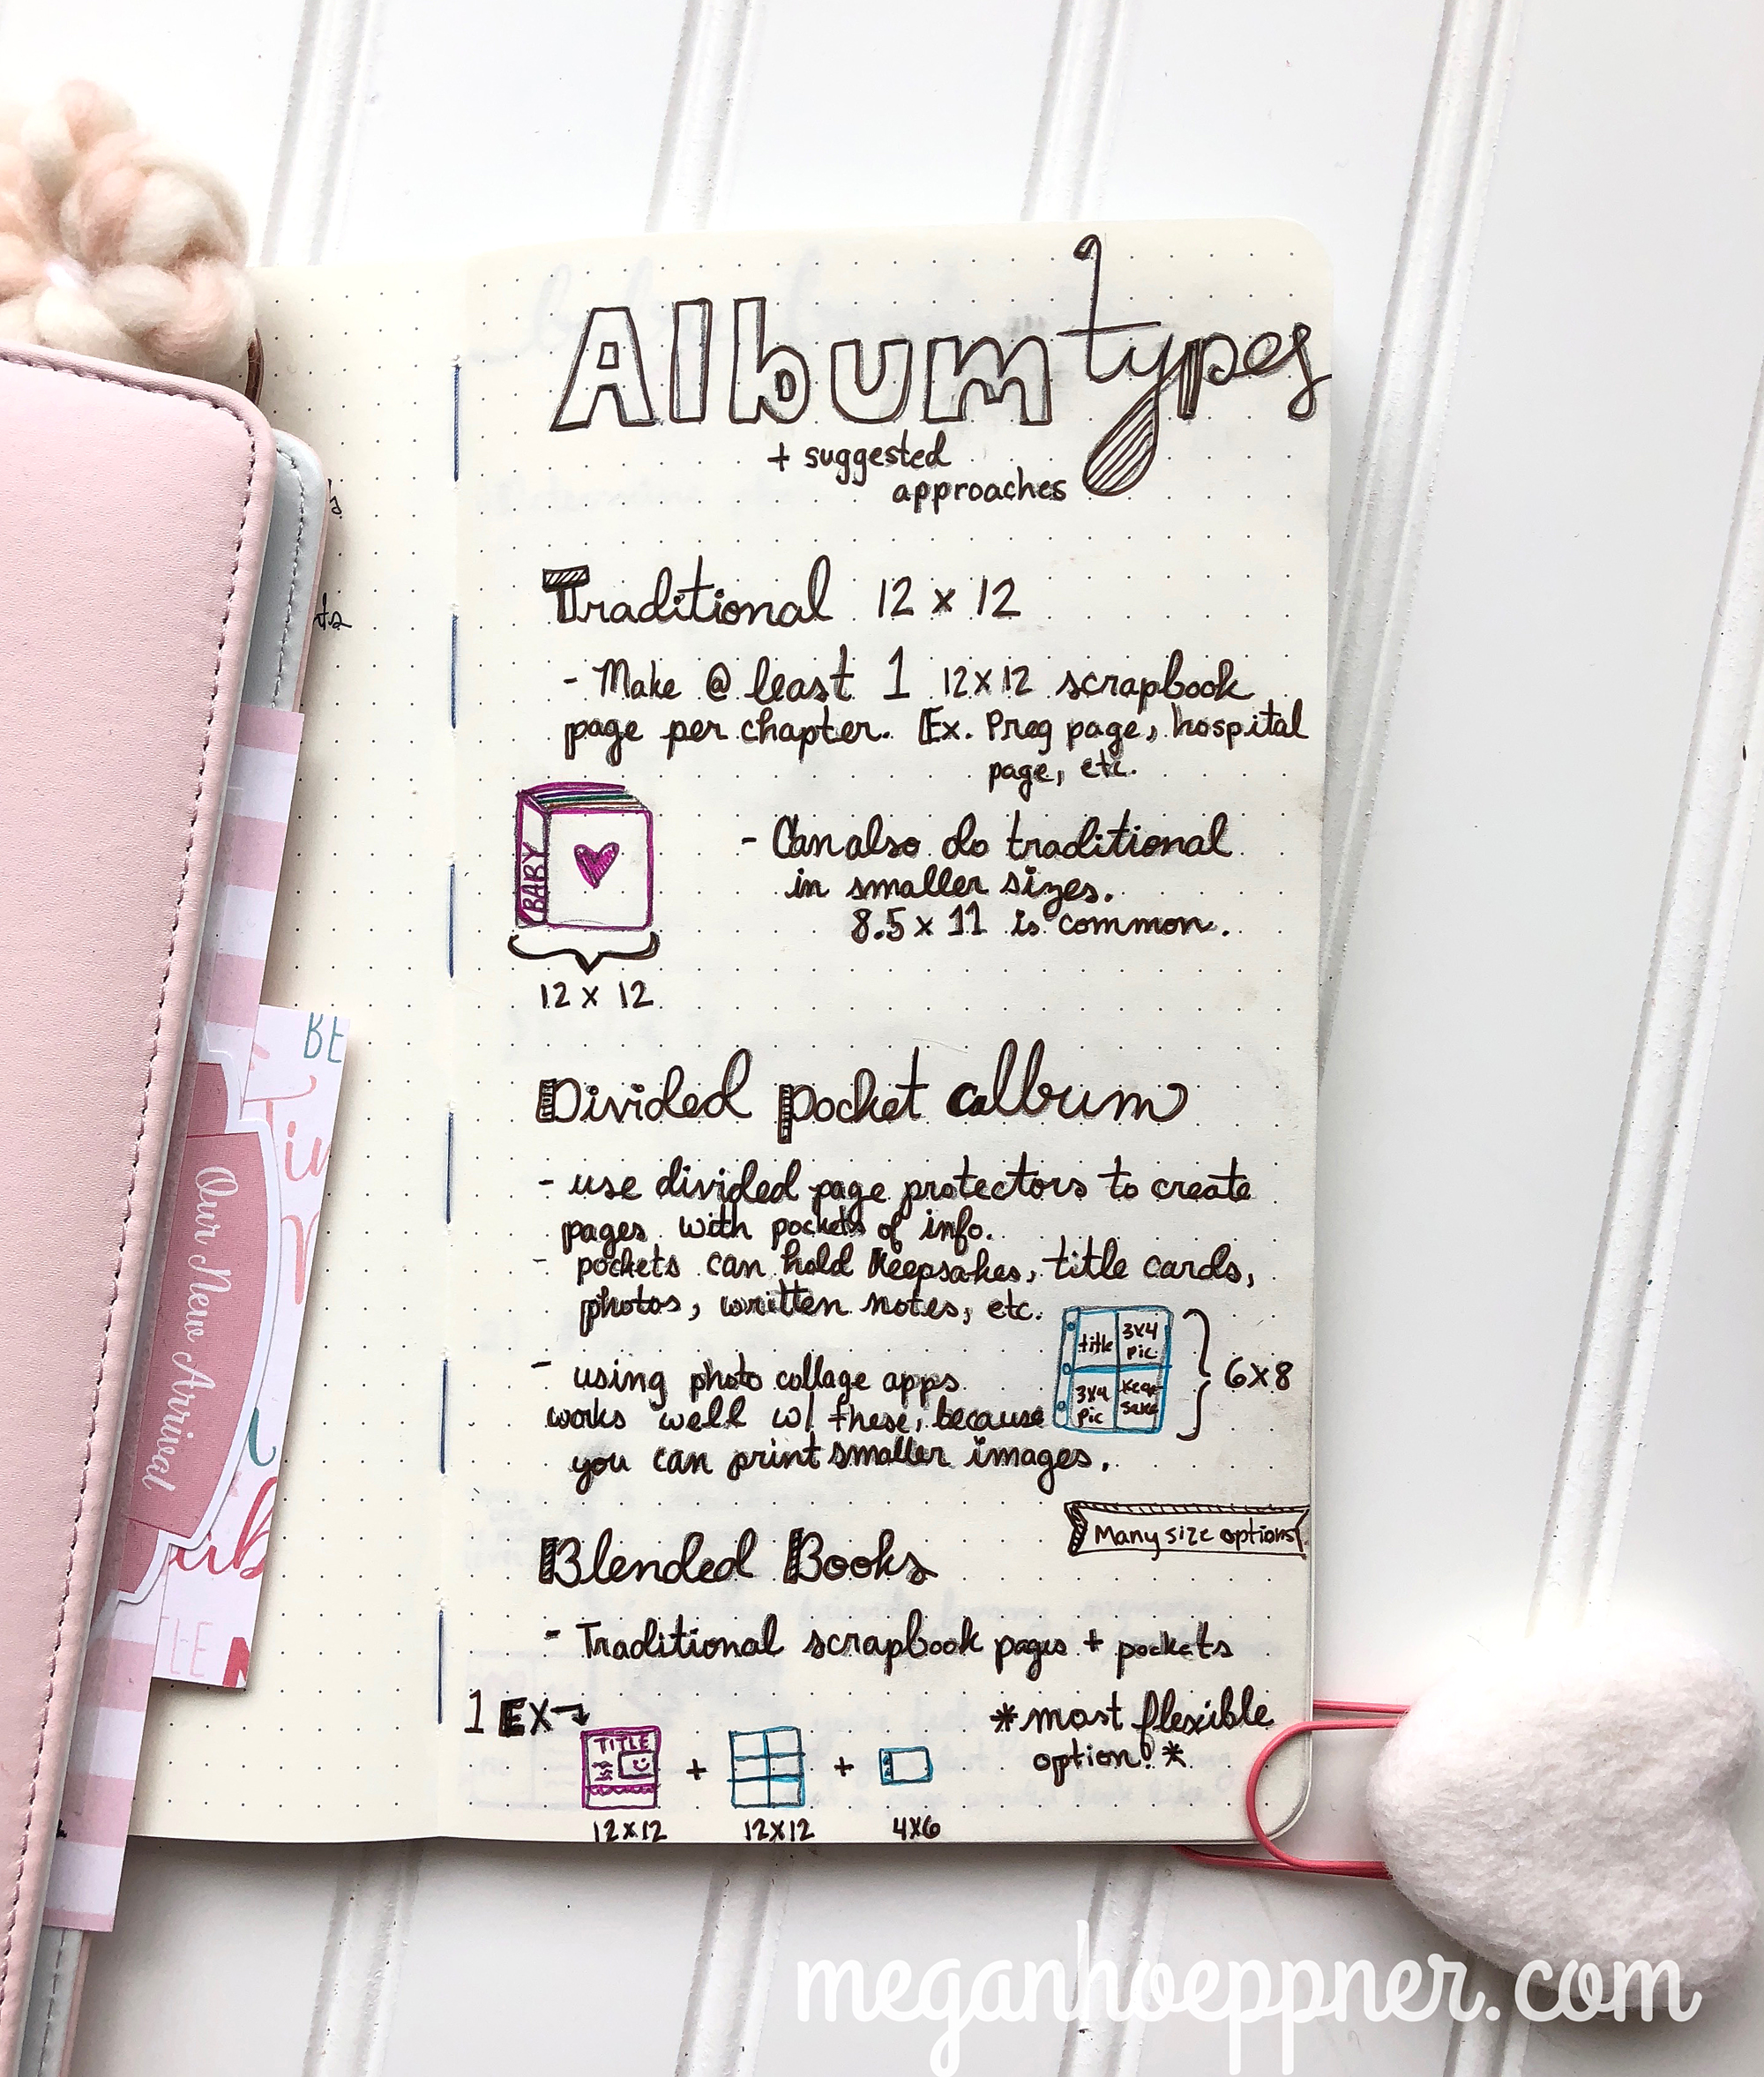 0baby-book_plan_albums.jpg